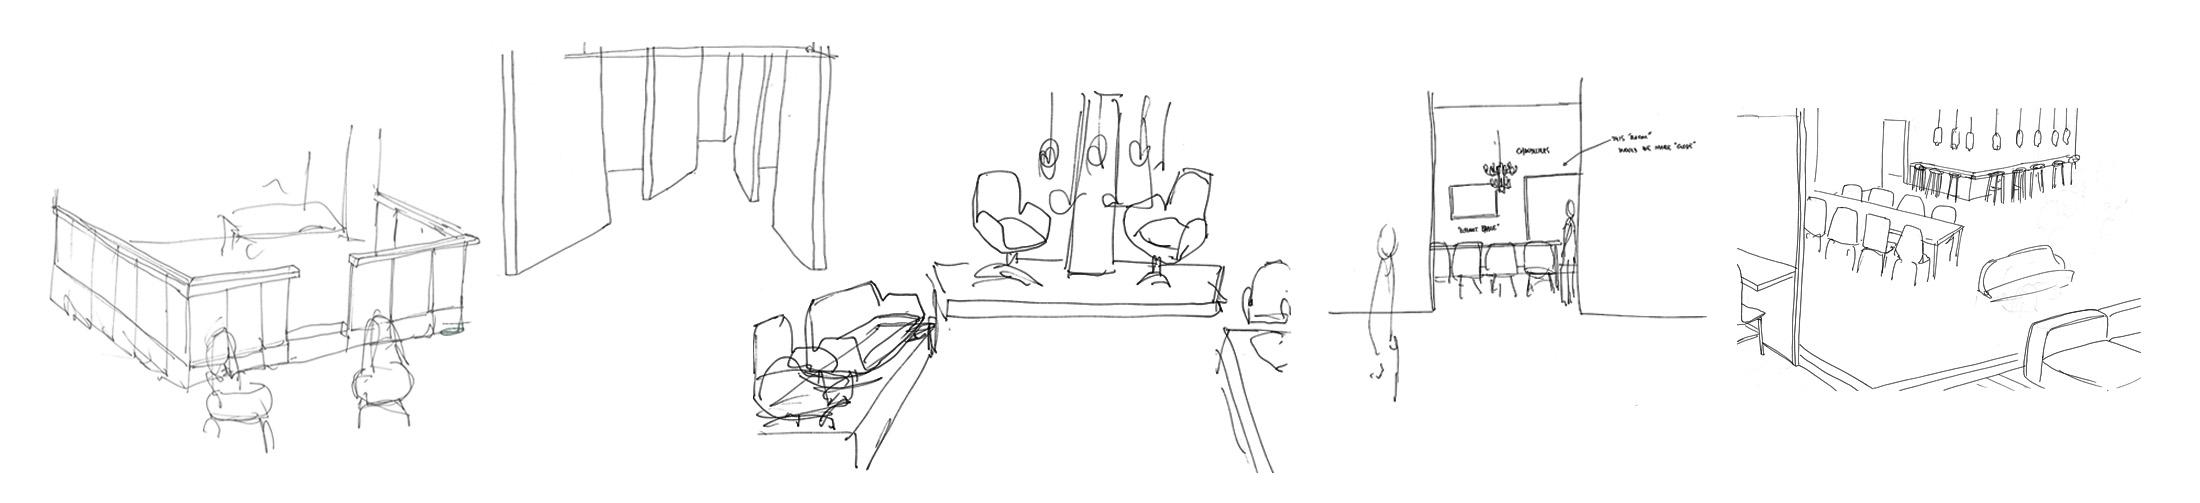 Orgatec sketch